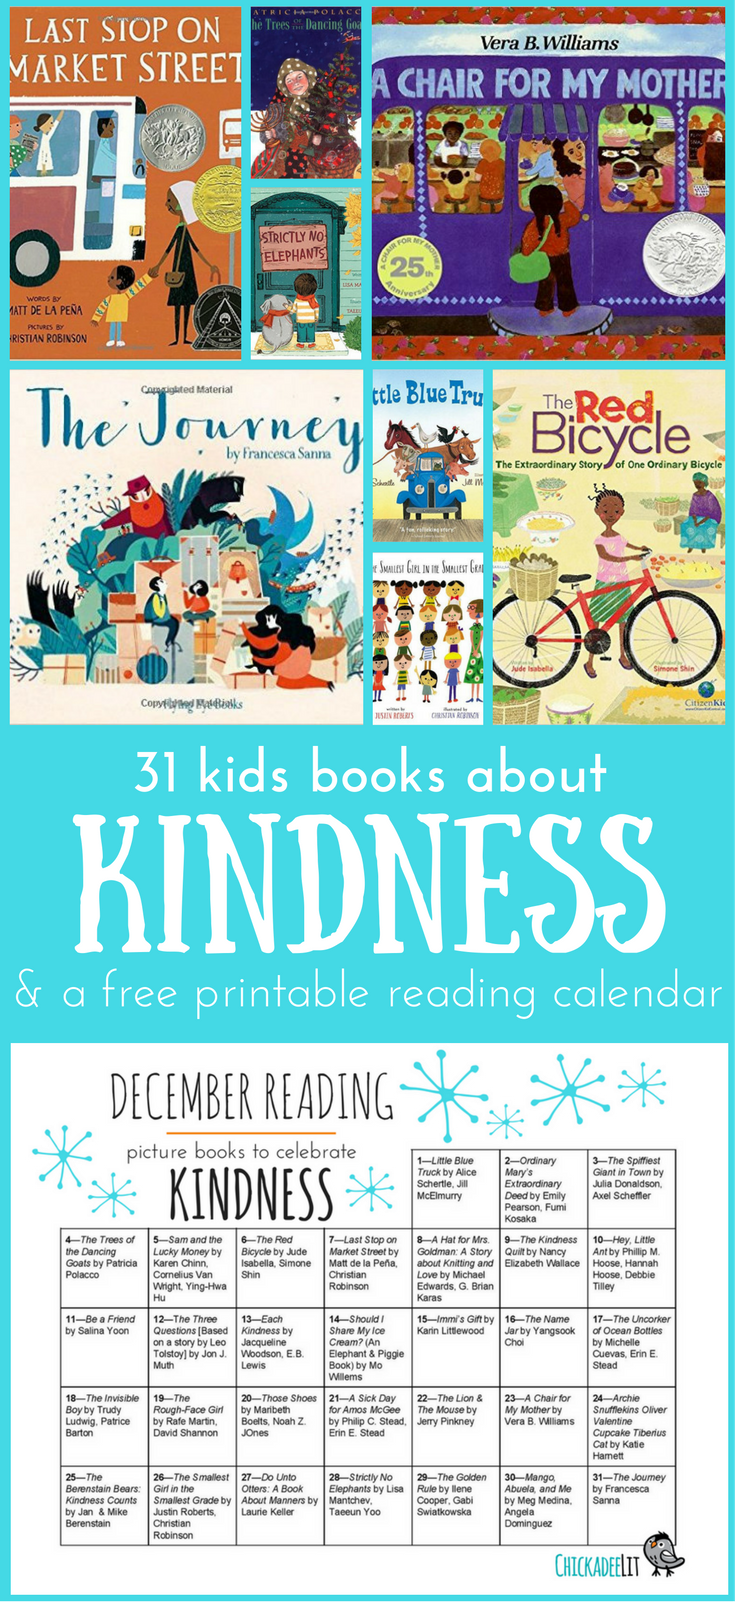 Kids Kindness Calendar : Celebrate kindness family reading calendar — chickadee lit